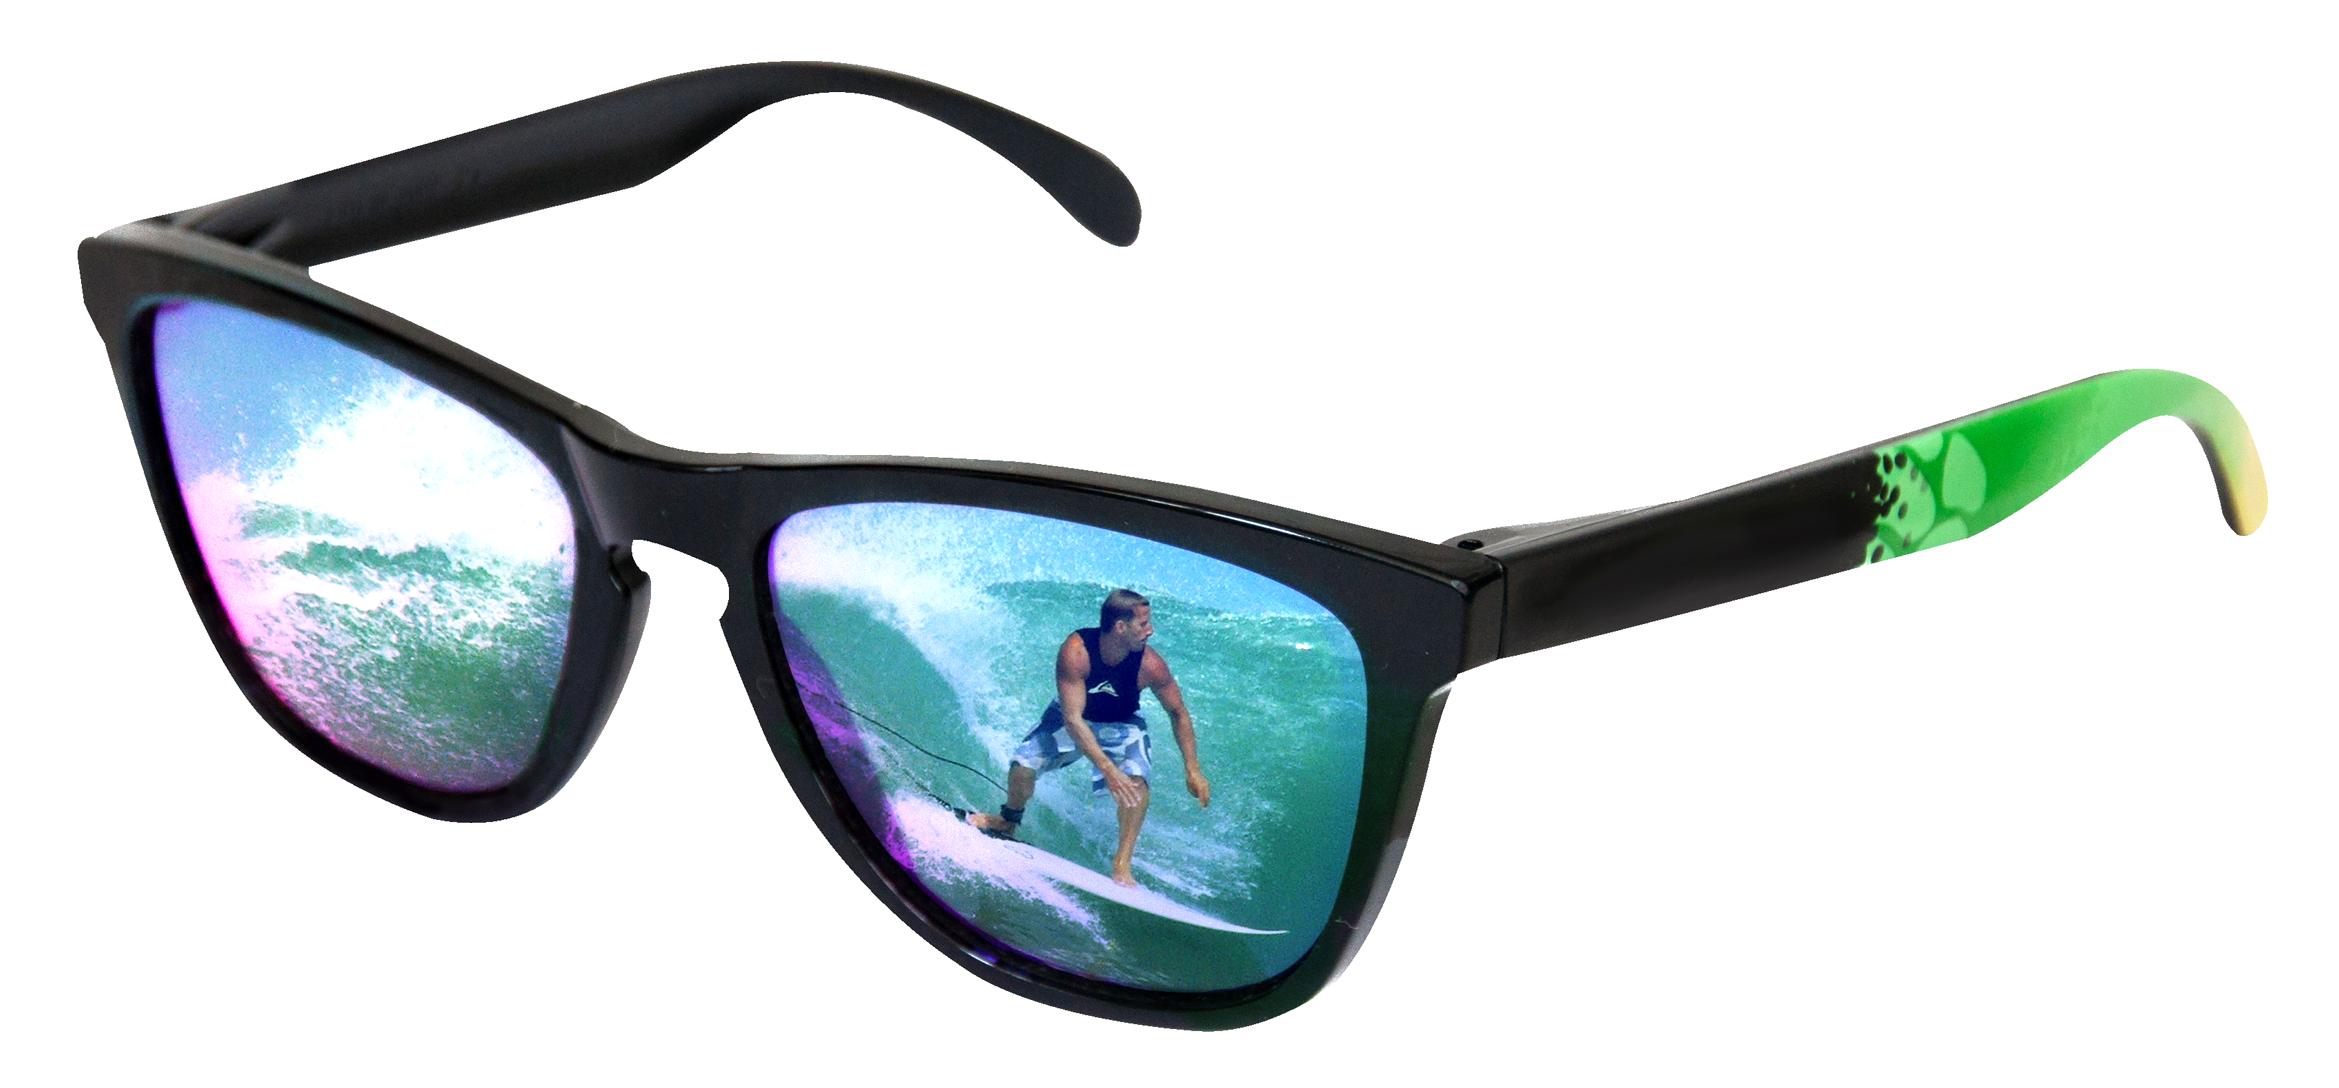 Png Sunglasses Hd Download Free Sunglasses Stylish Sunglasses Picsart